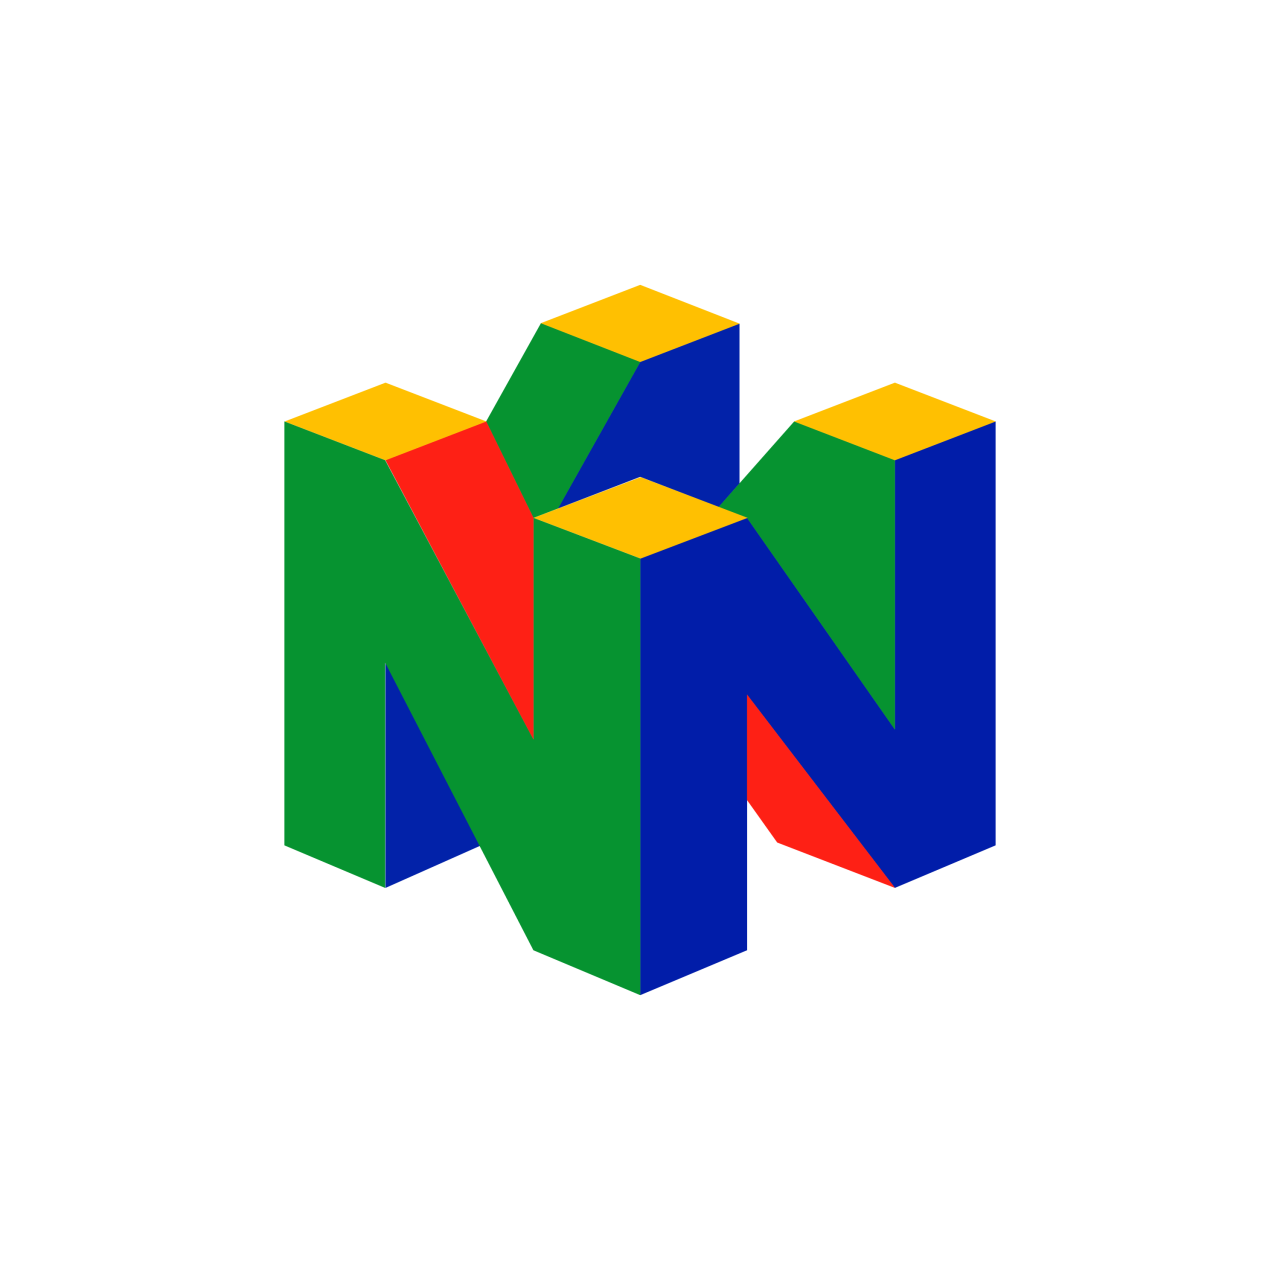 Nintendo 64 Designer Unknown Firm In House Year 1996 Nintendo Tattoo Nintendo Logo Retro Logos